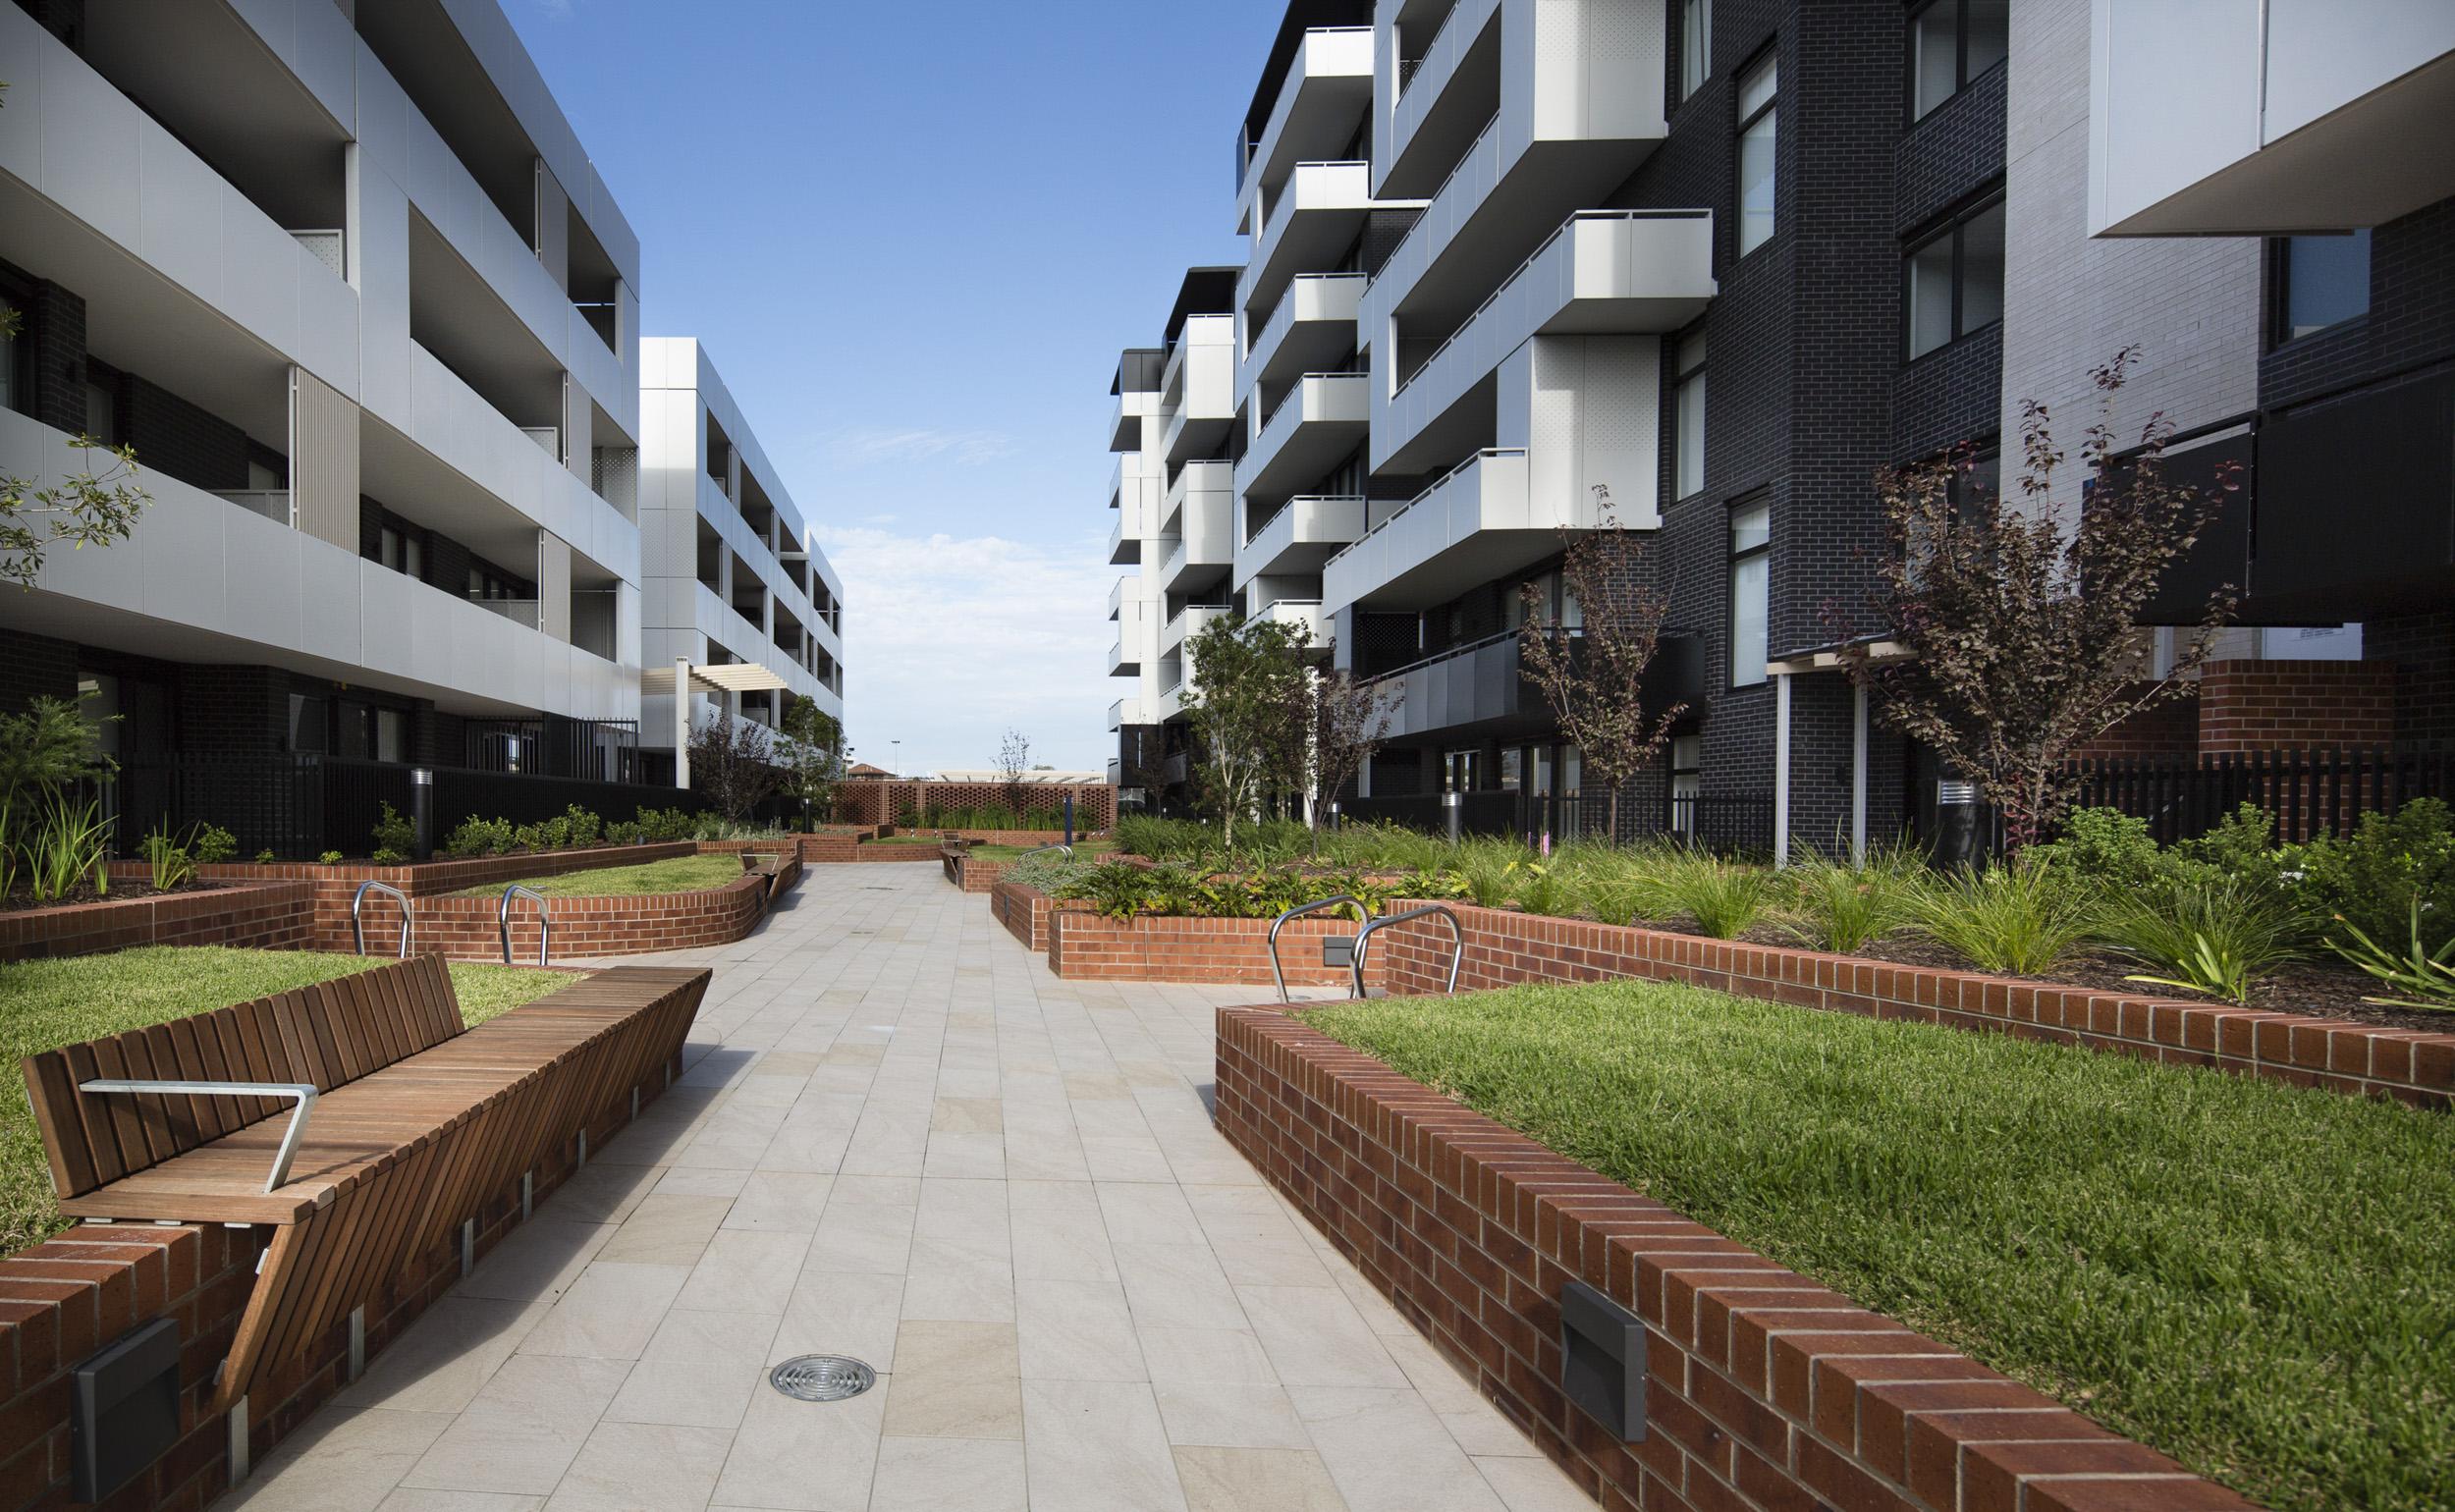 architecture_photography_sydney_australia_26.jpg